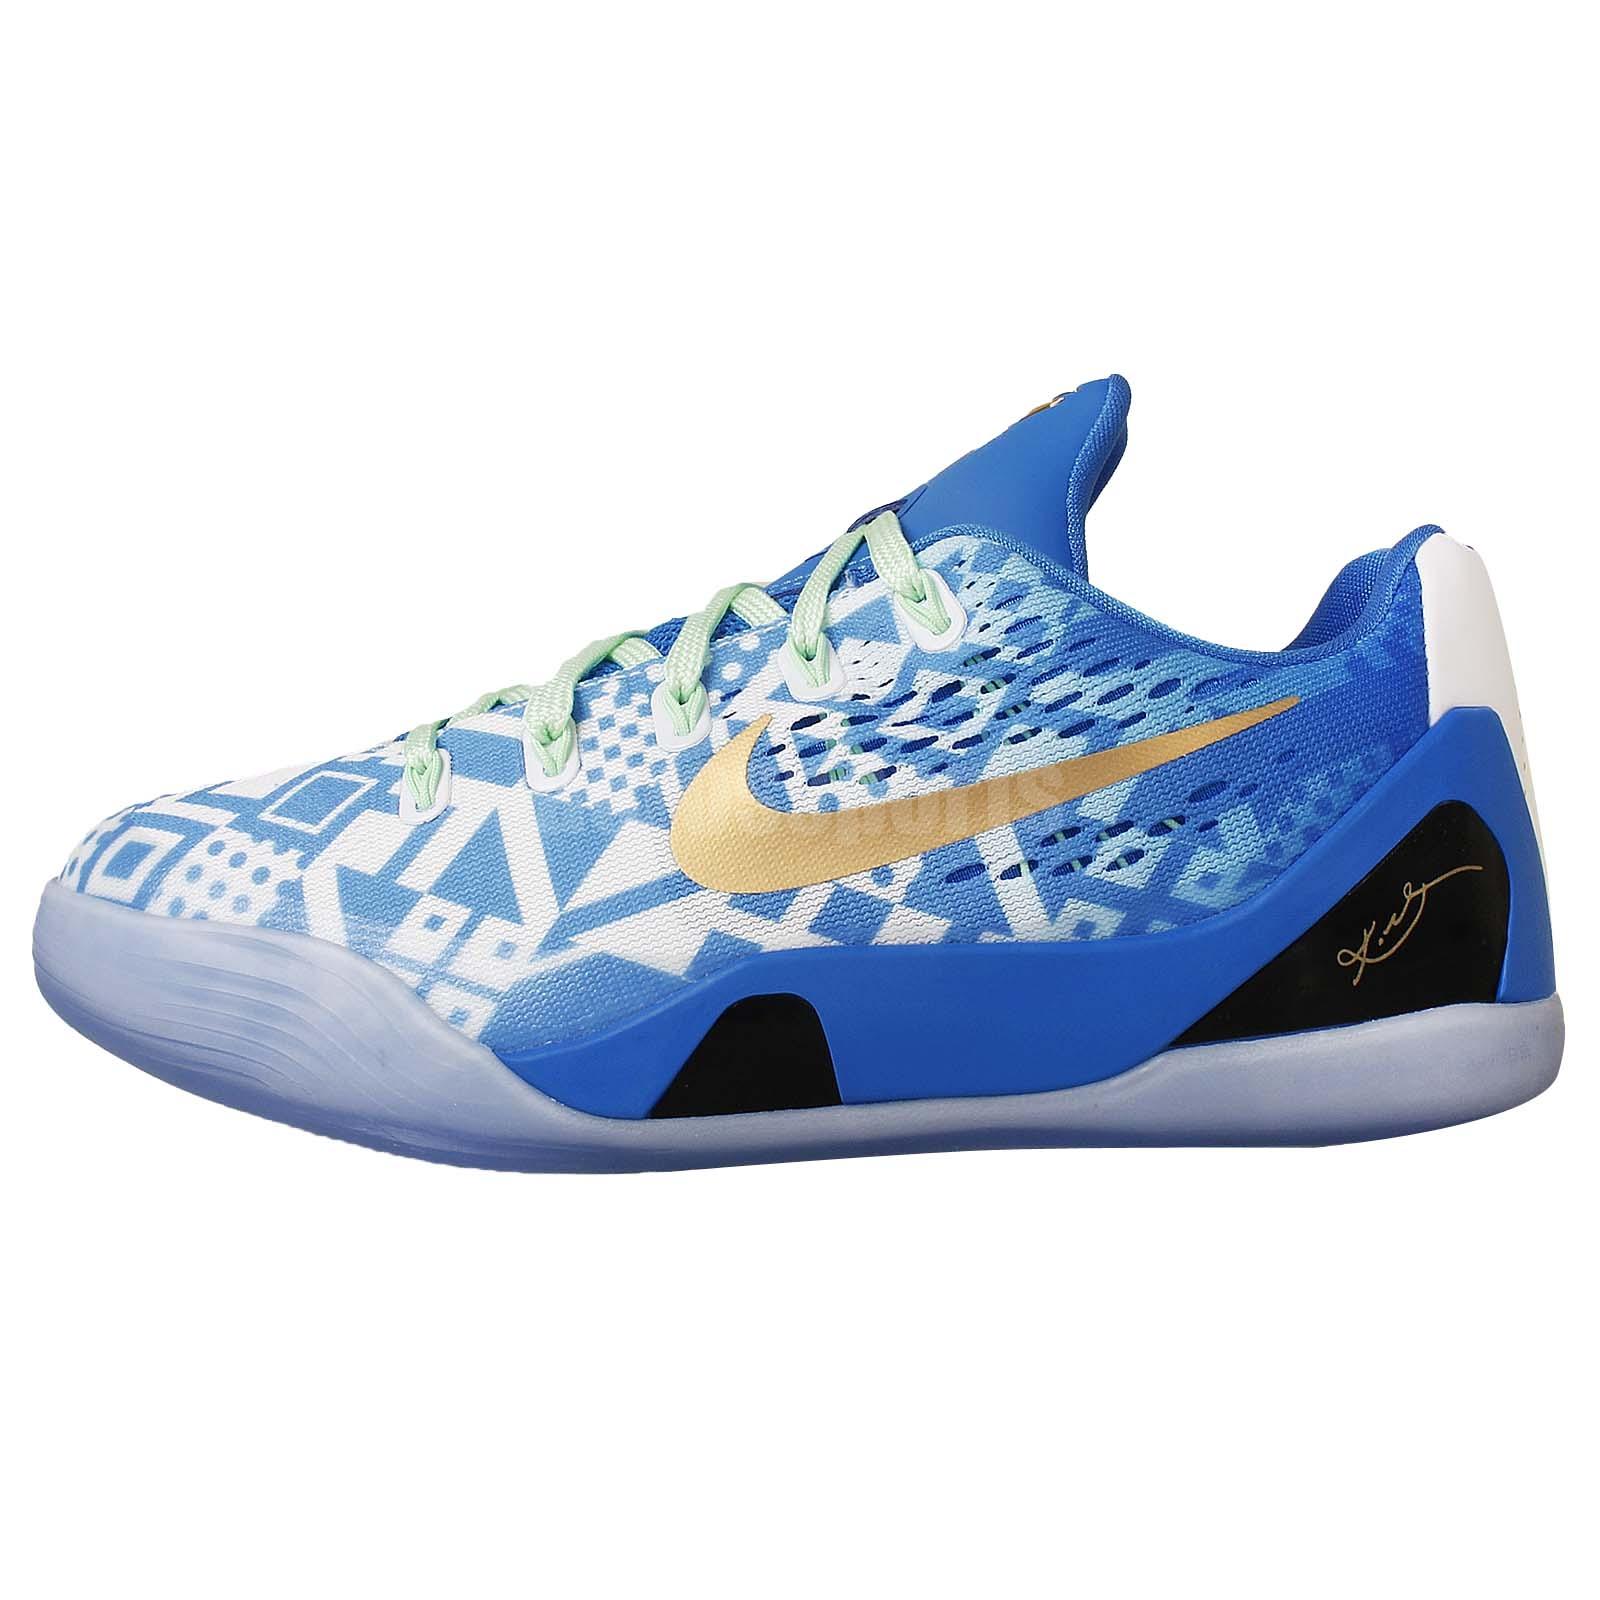 Kobe Ix Youth Basketball Shoes